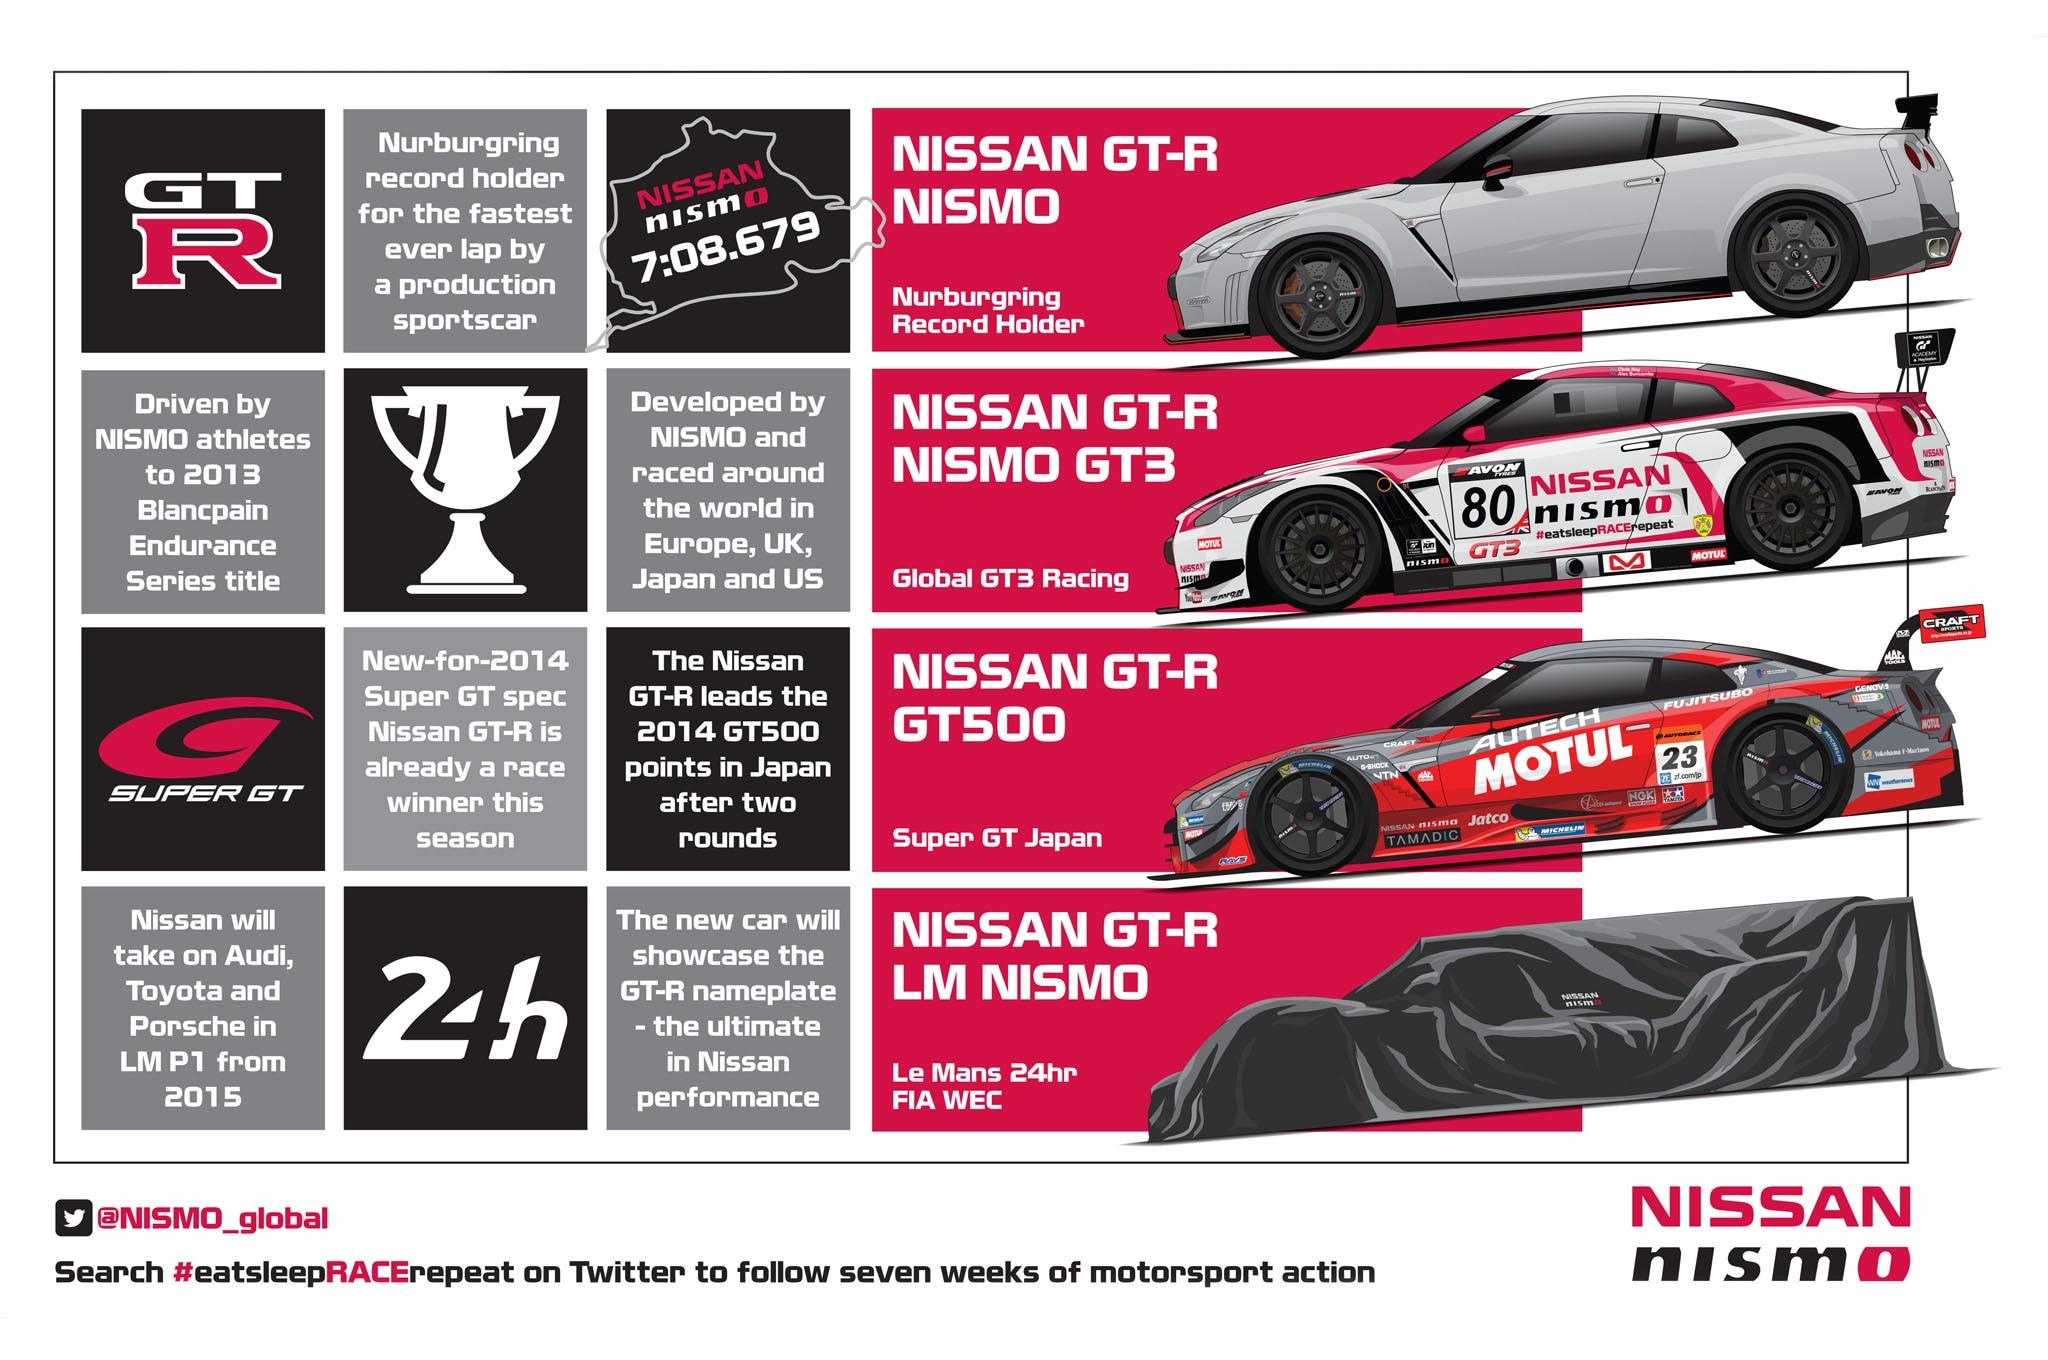 Nissan NISMO Racer Cars